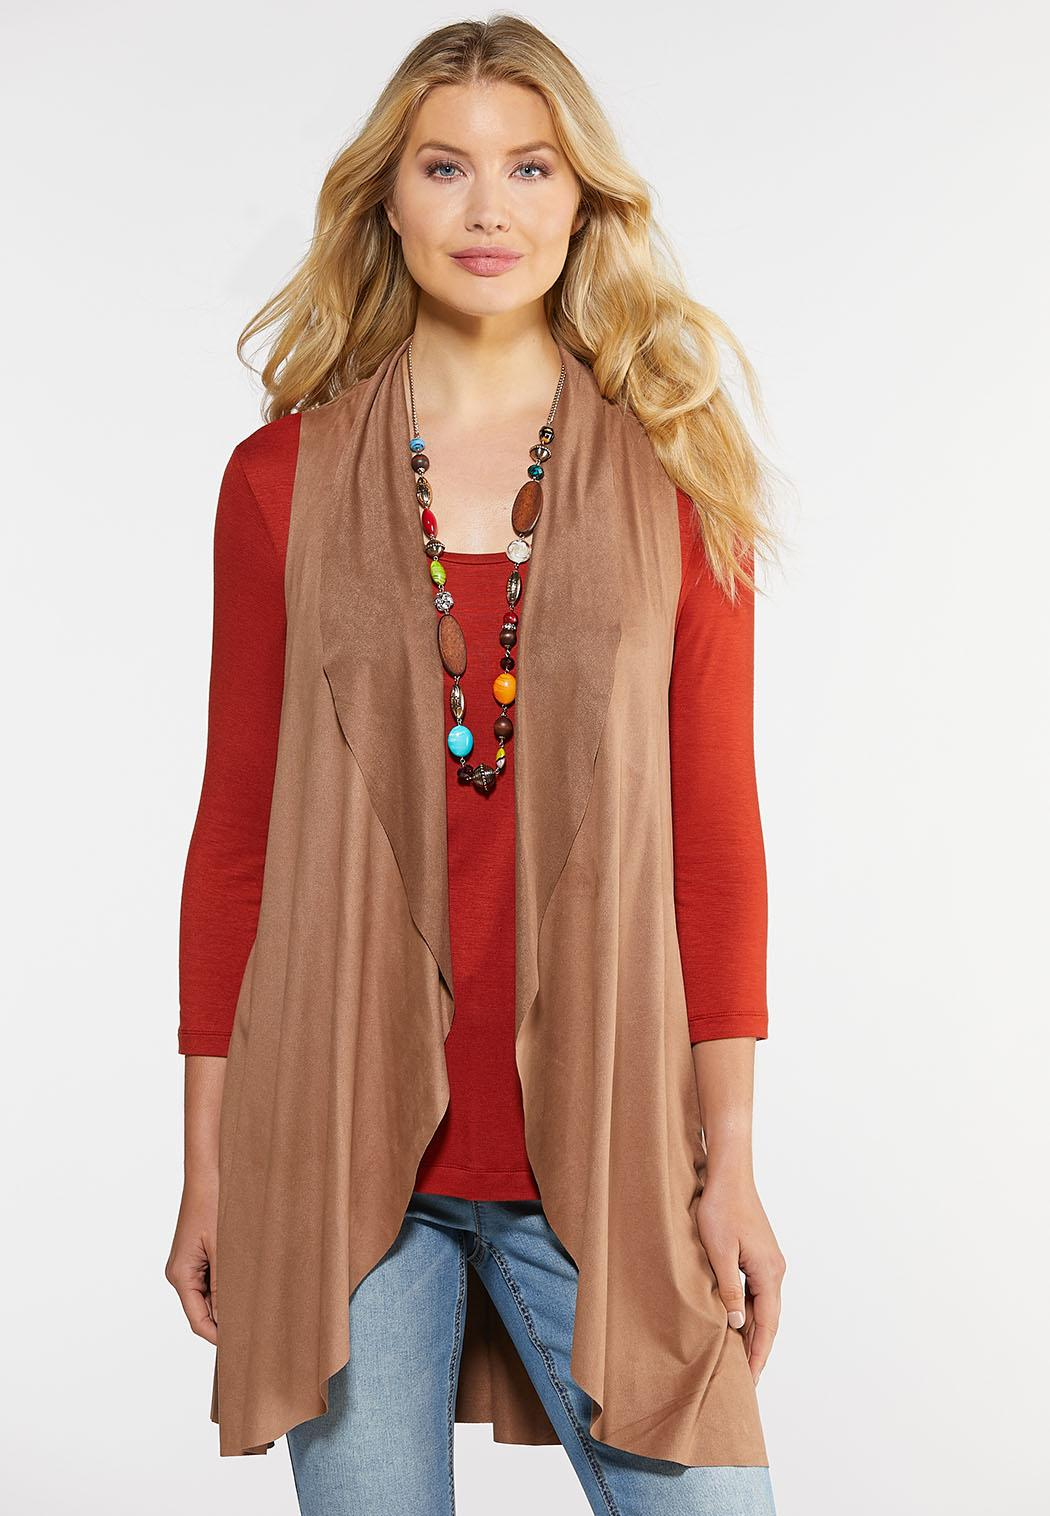 bd05e47a2b Plus Size Women's Clothing   Affordable Fashion for Plus Sizes